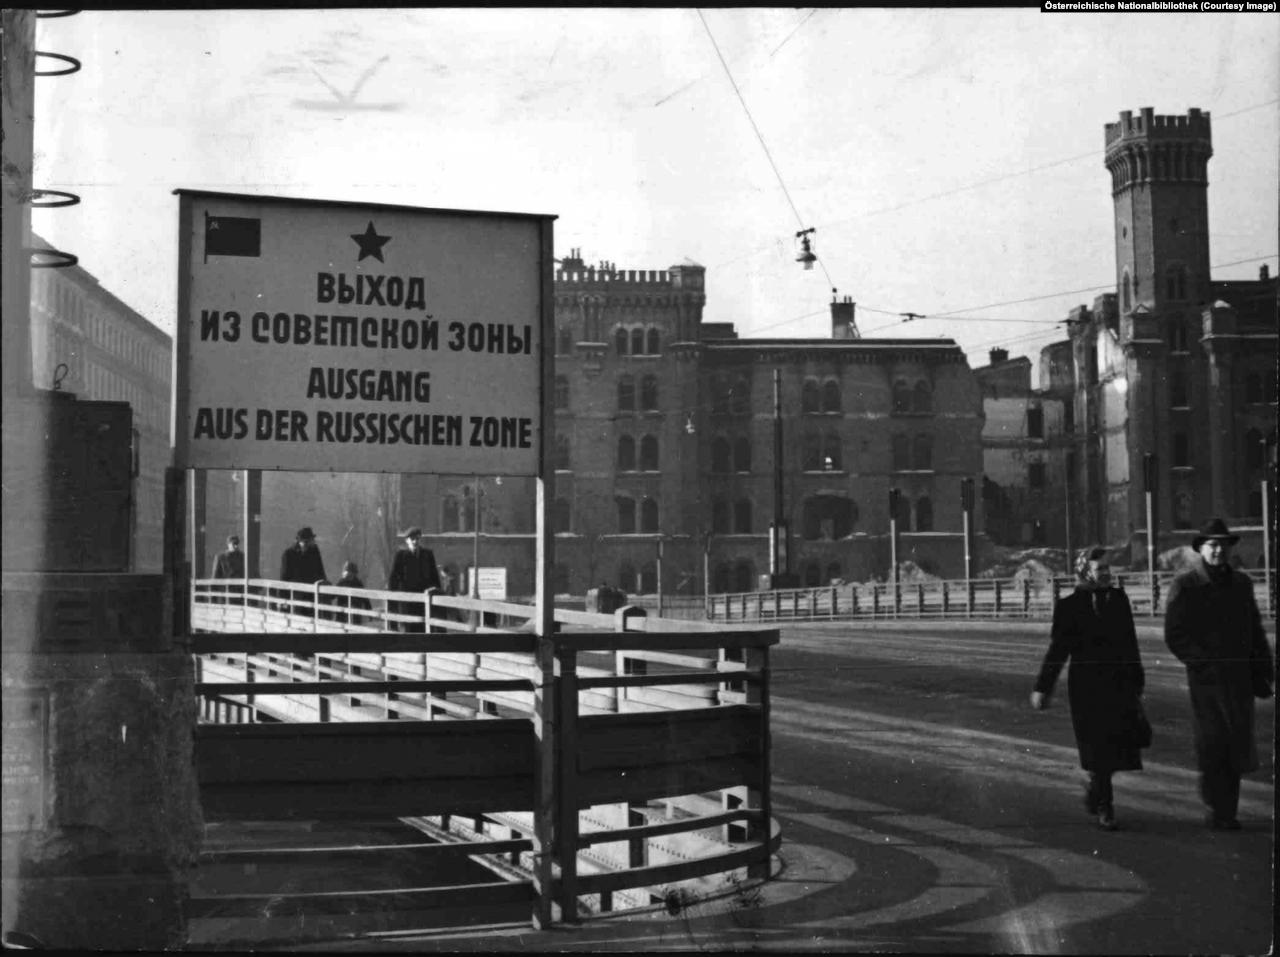 In 1945 Vienna was split on occupation zones, just as it was in Berlin